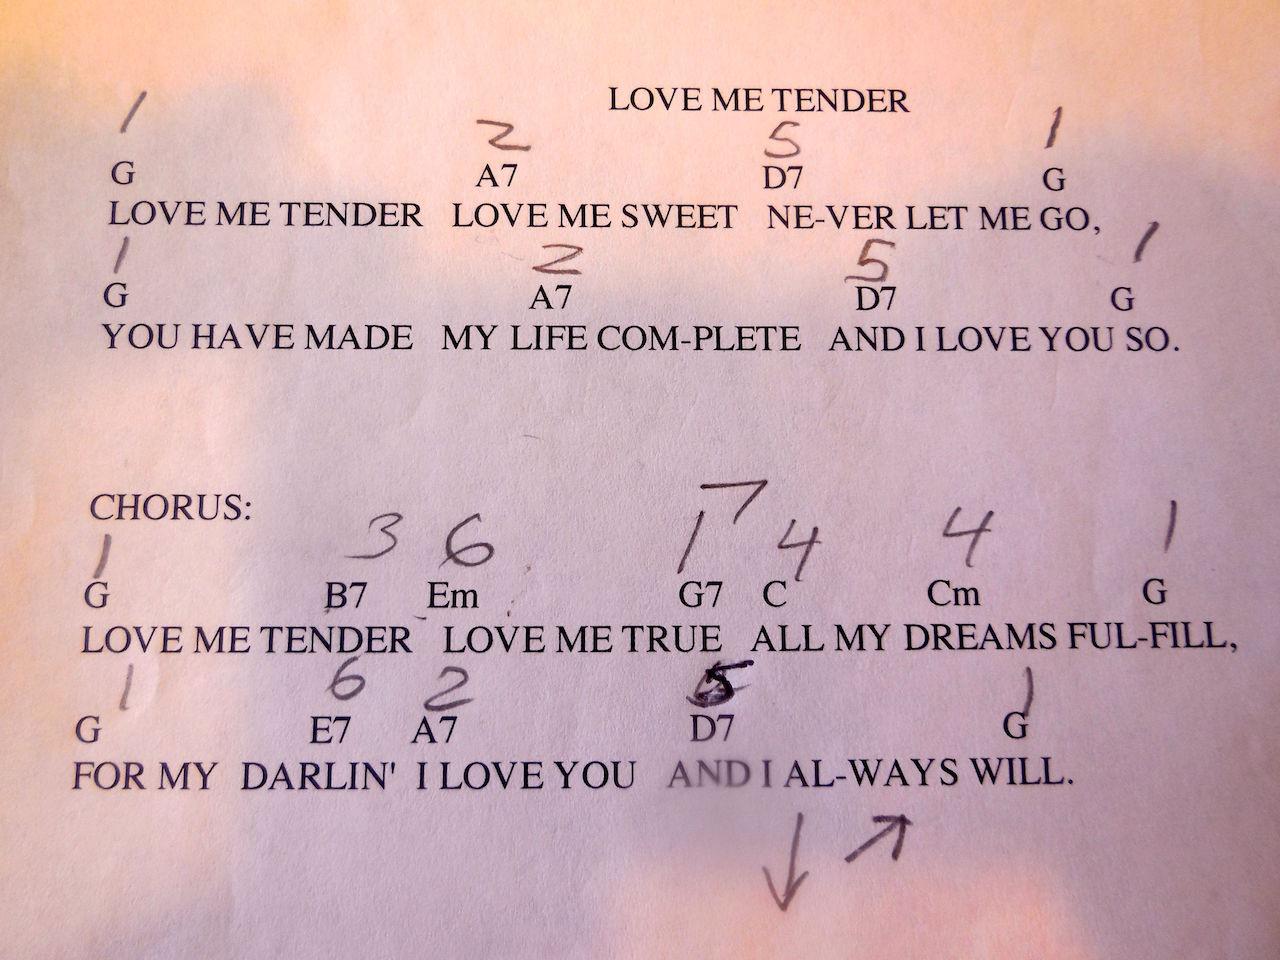 Chords and lyrics love me tenderg hexwebz Images